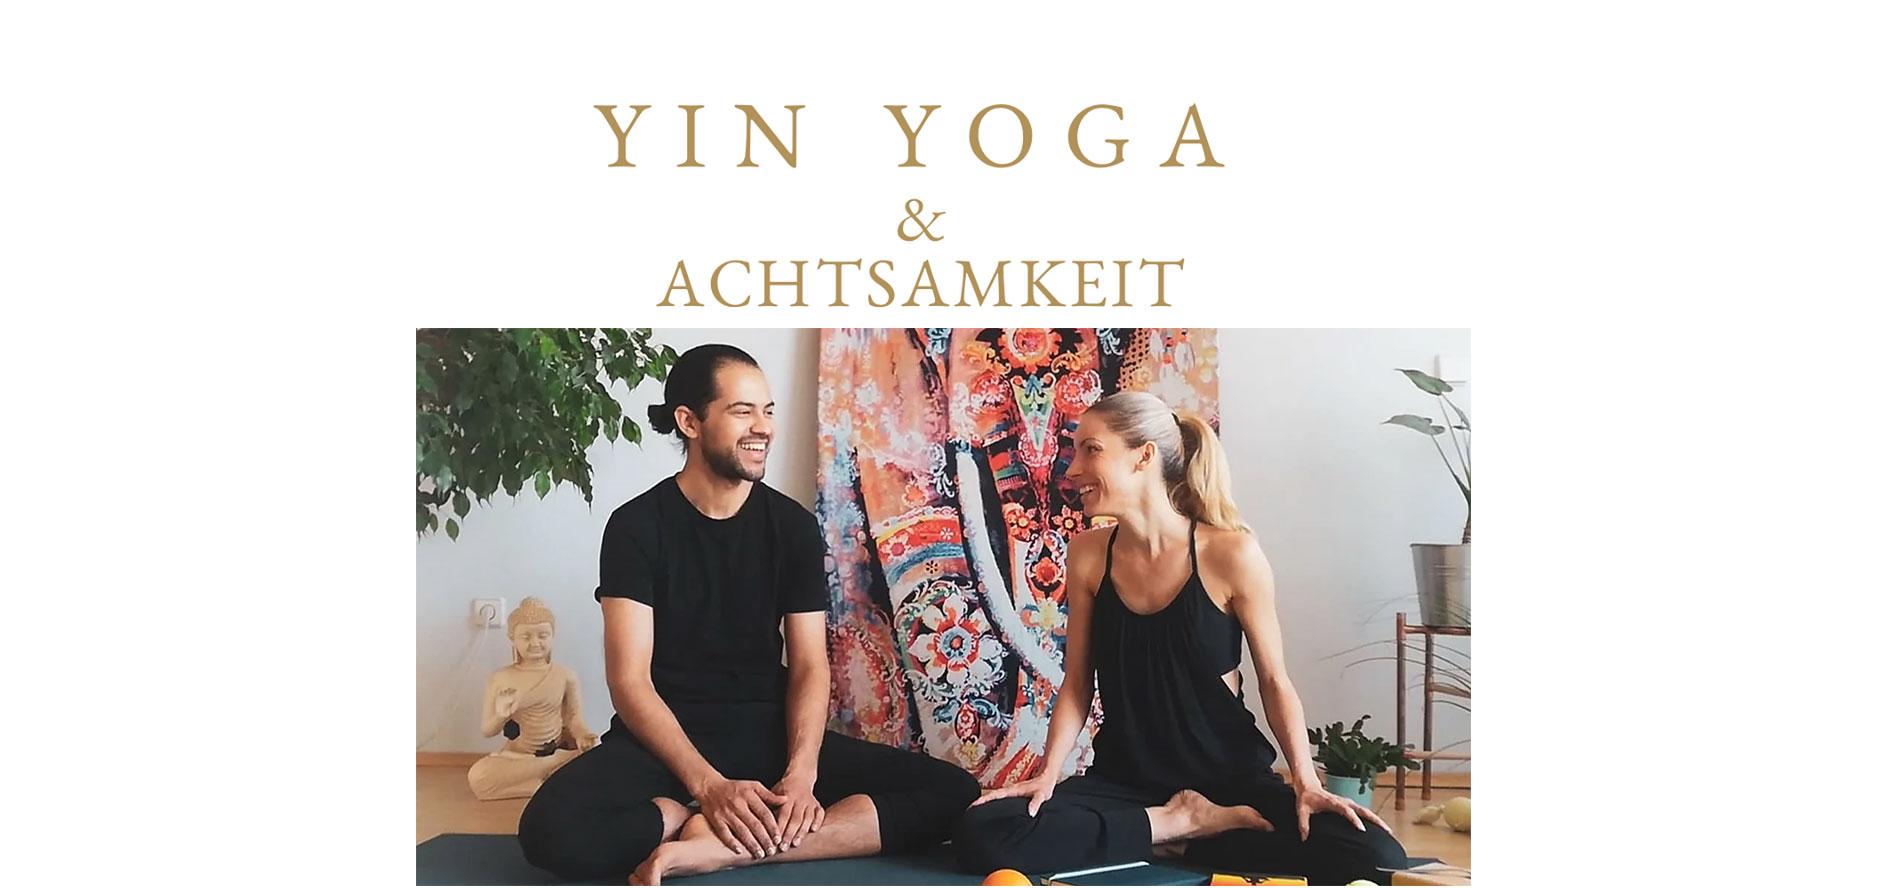 Yin Yoga Sharma radiantyinsight